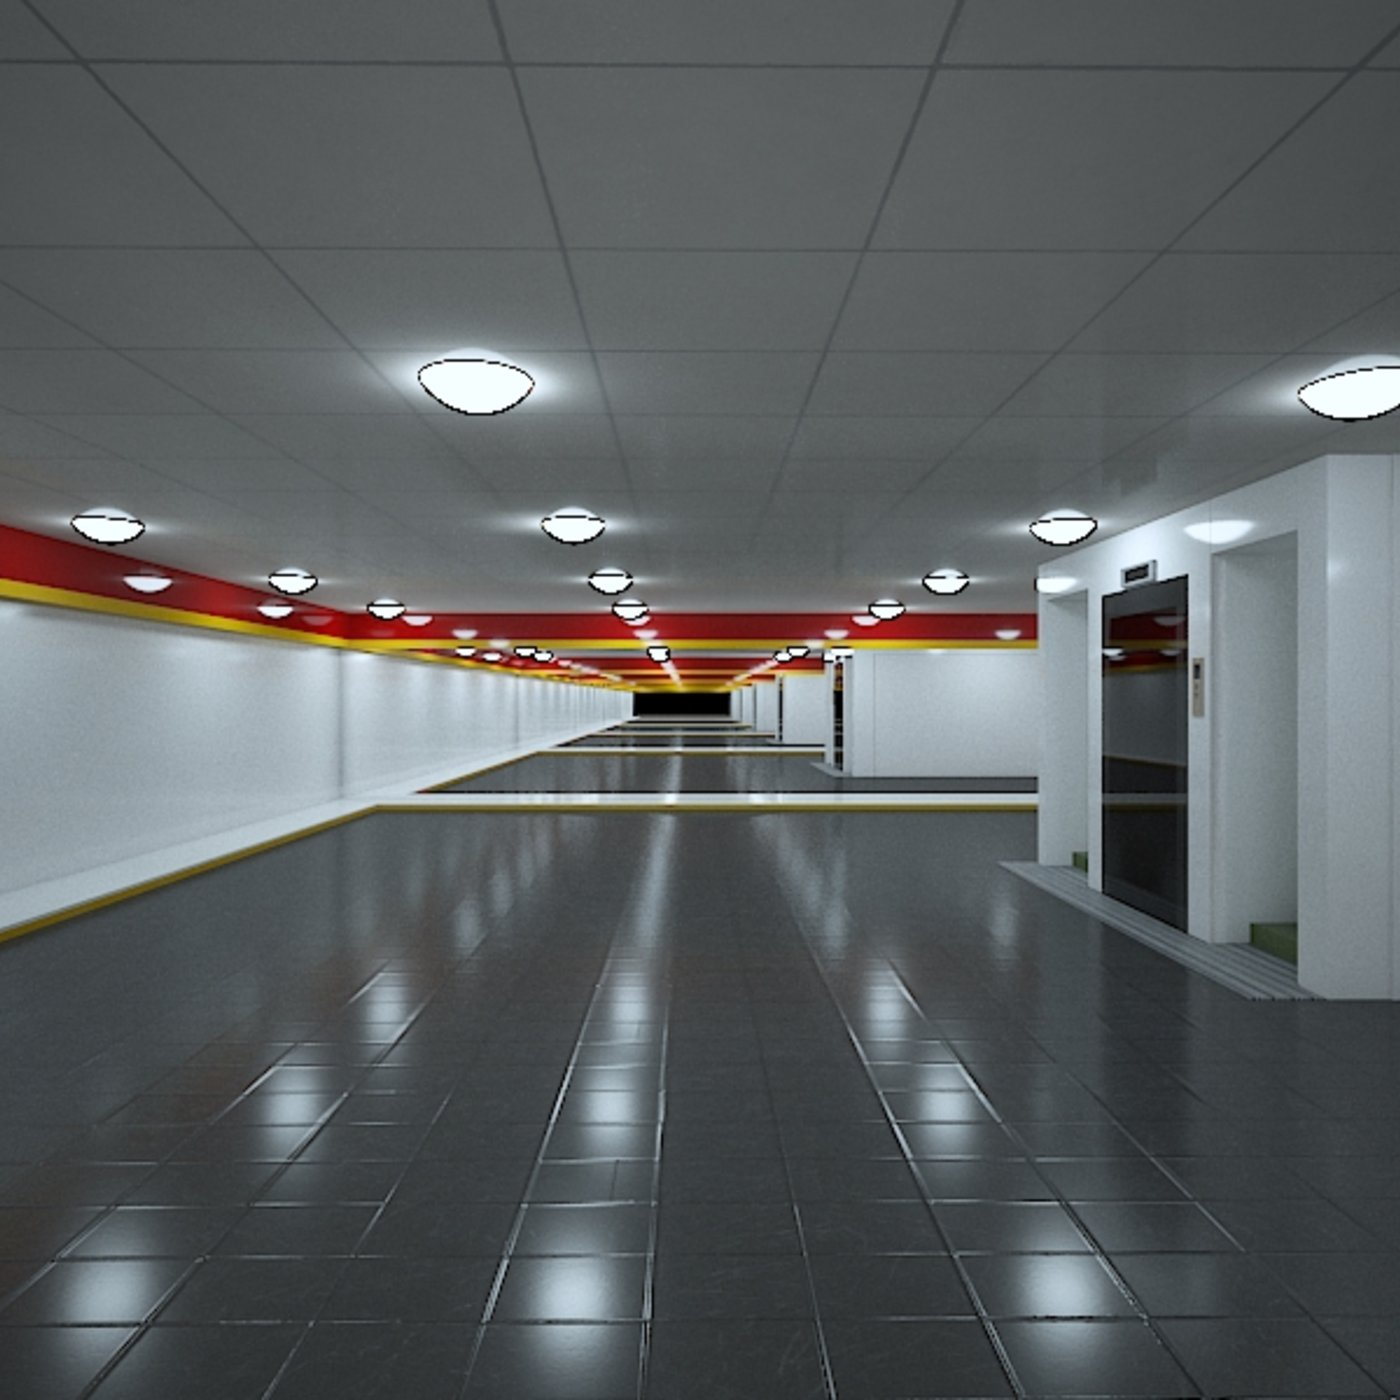 empty shopping centre hall